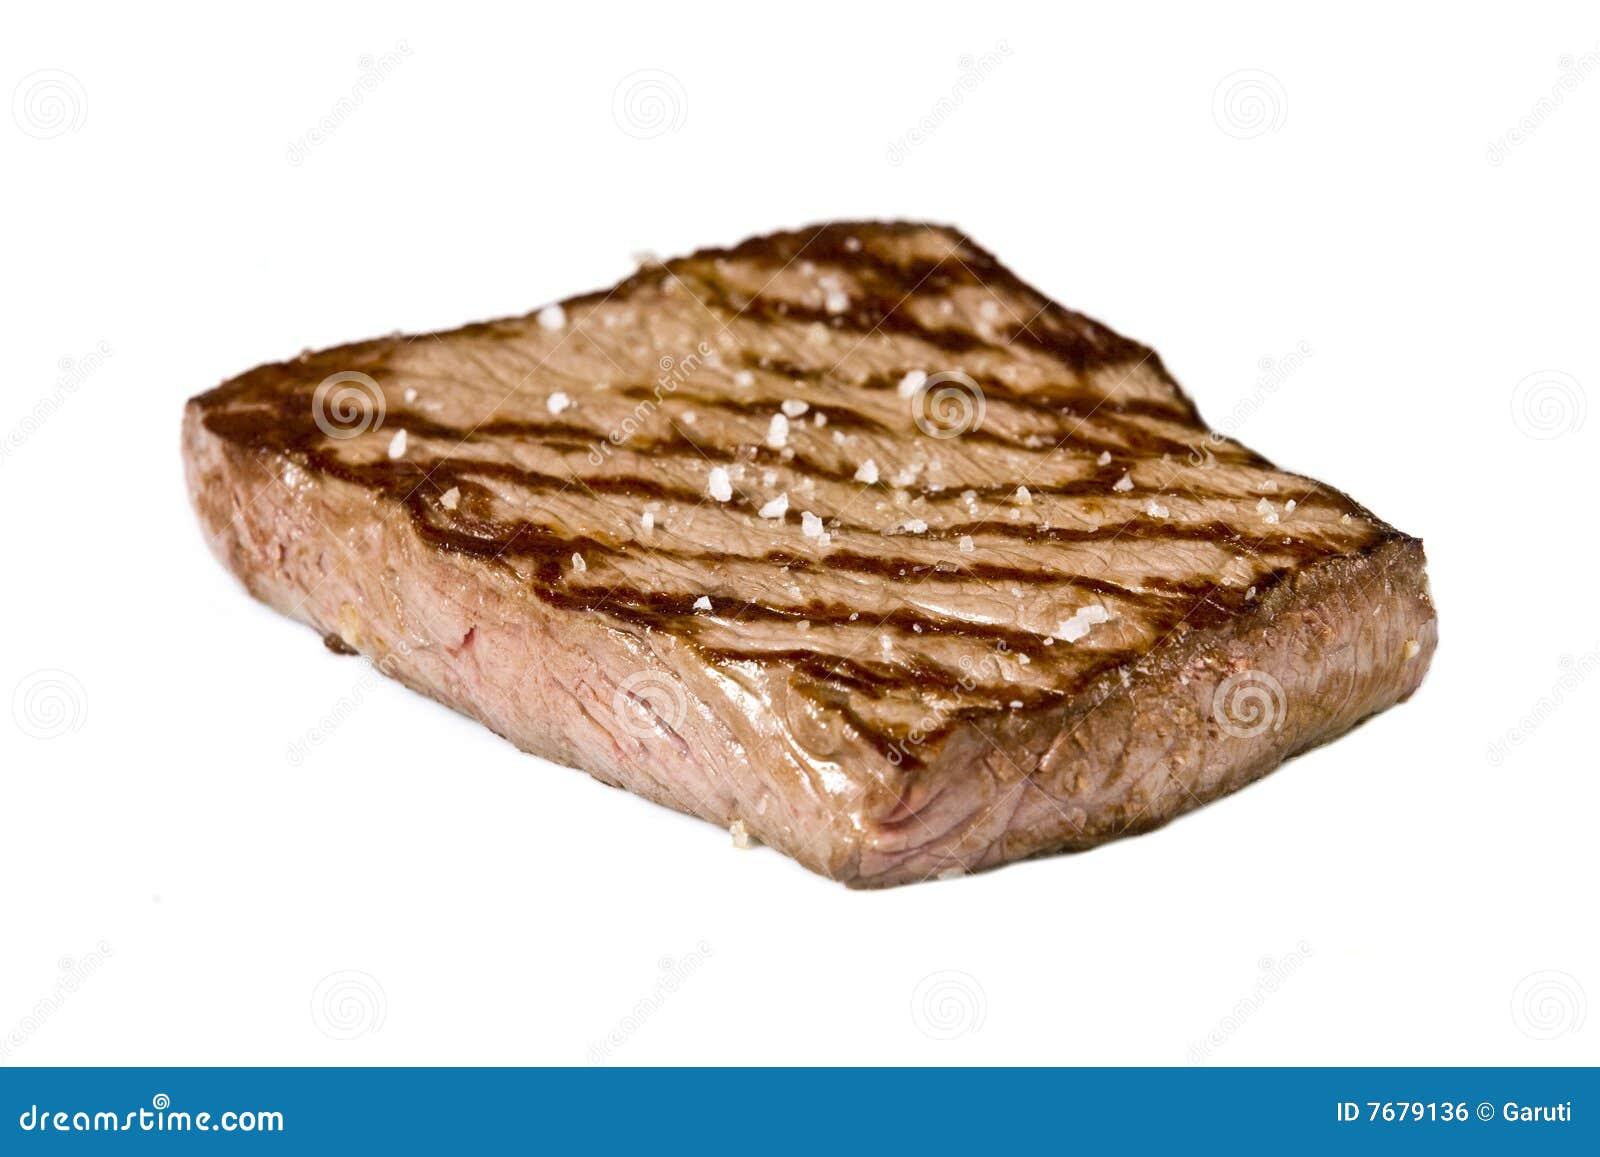 how to prepare rump steak